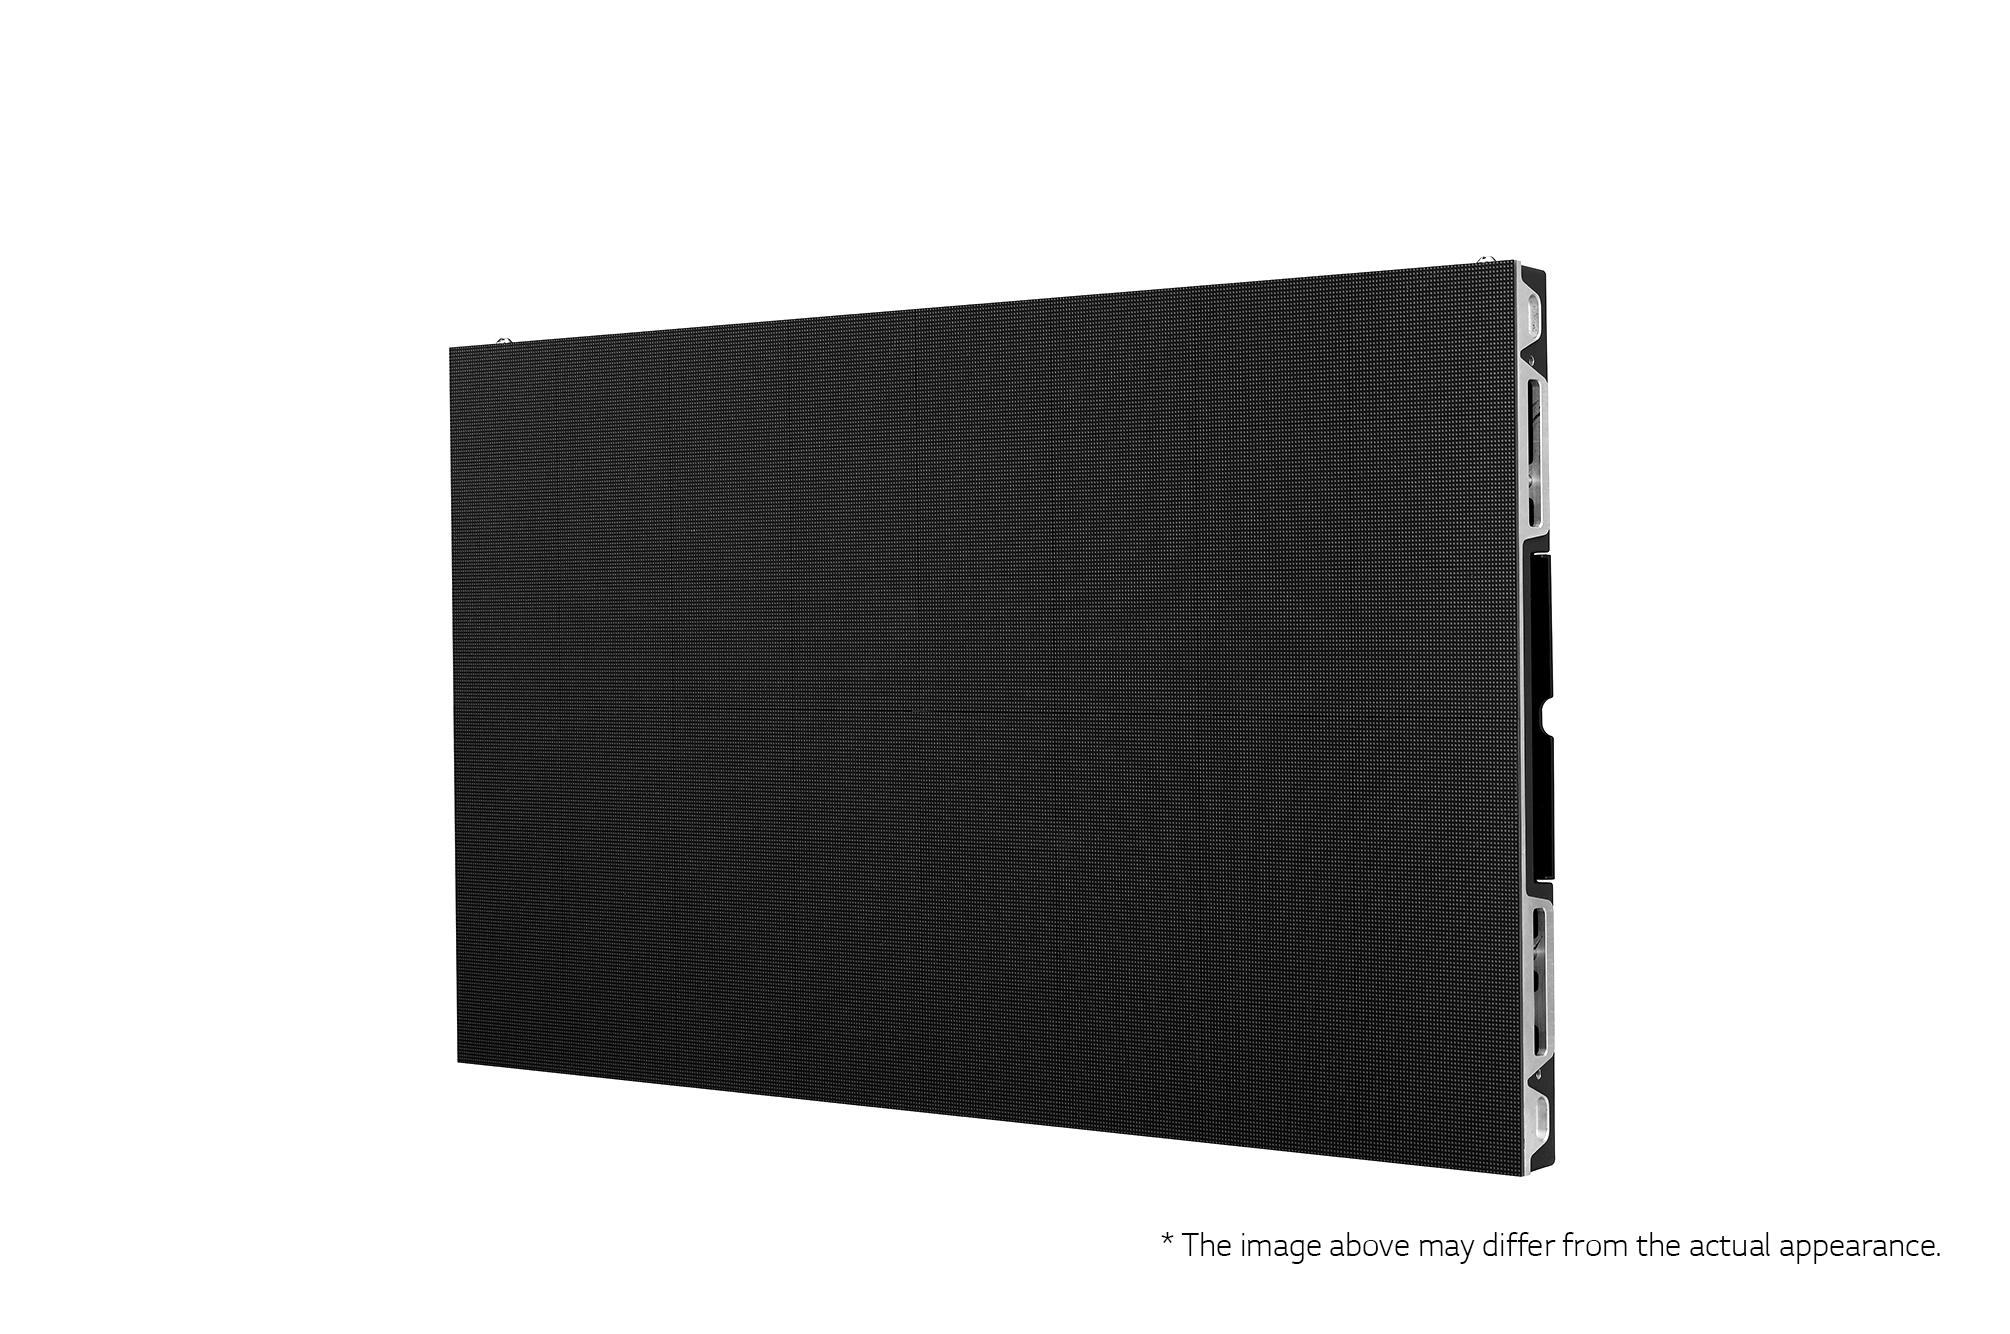 LG Ultra Slim LSCB025 3